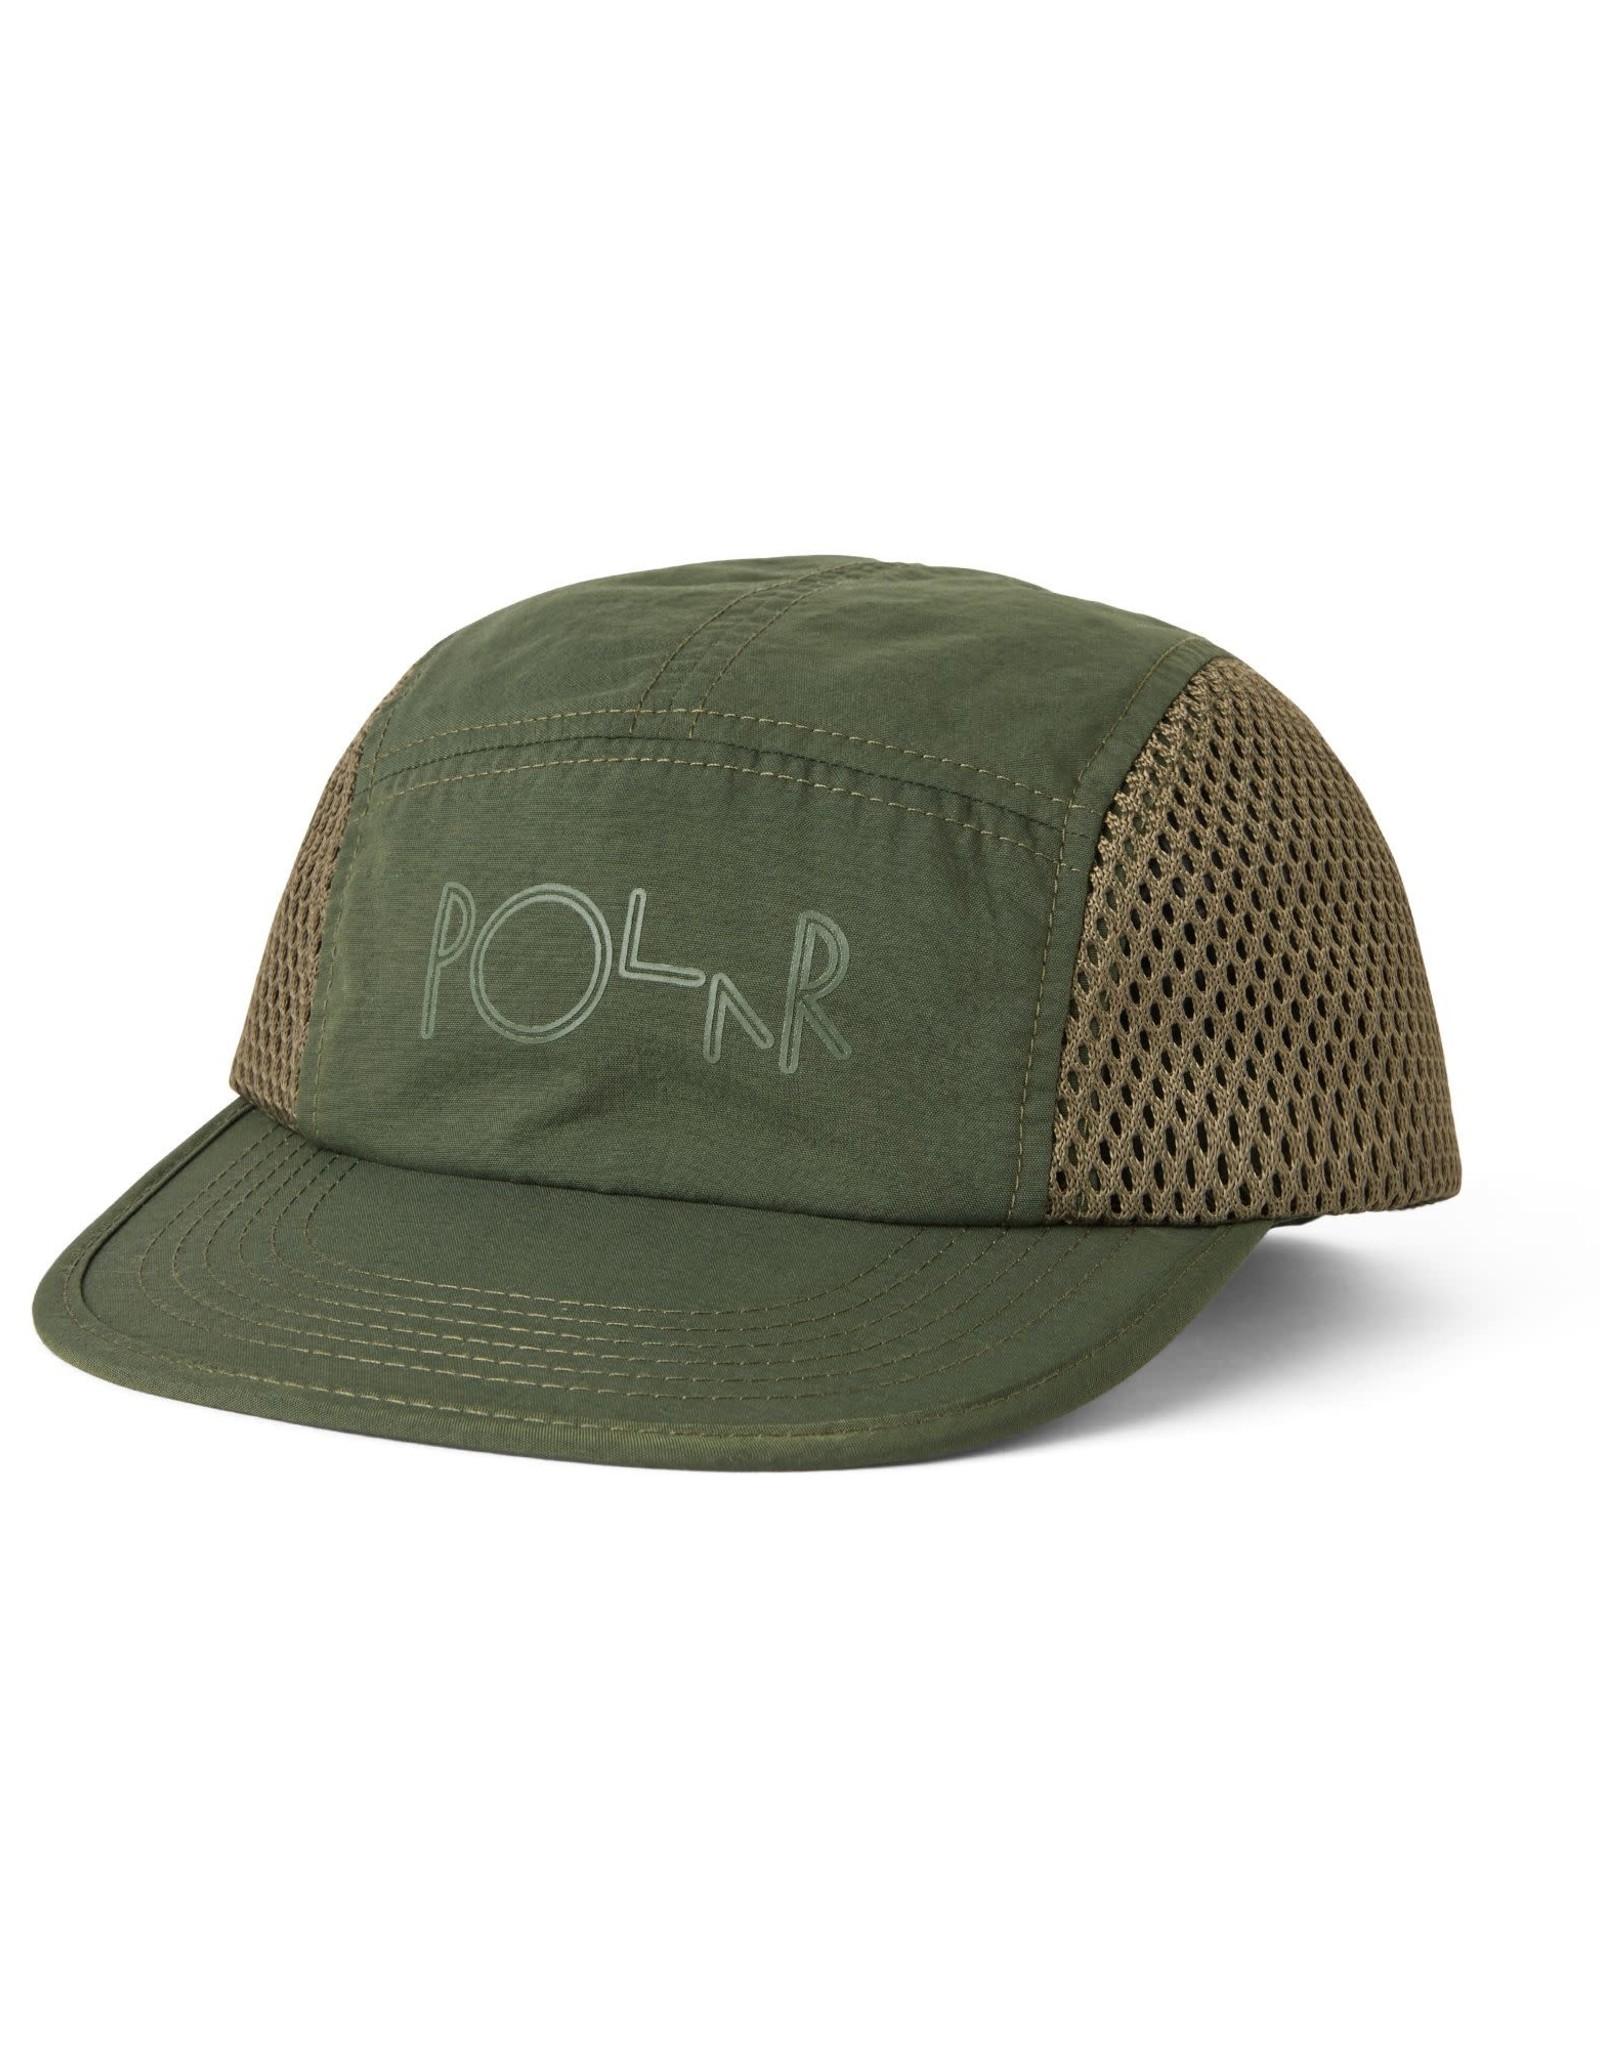 POLAR POLAR MESH SPEED CAP OLIVE GREEN HAT